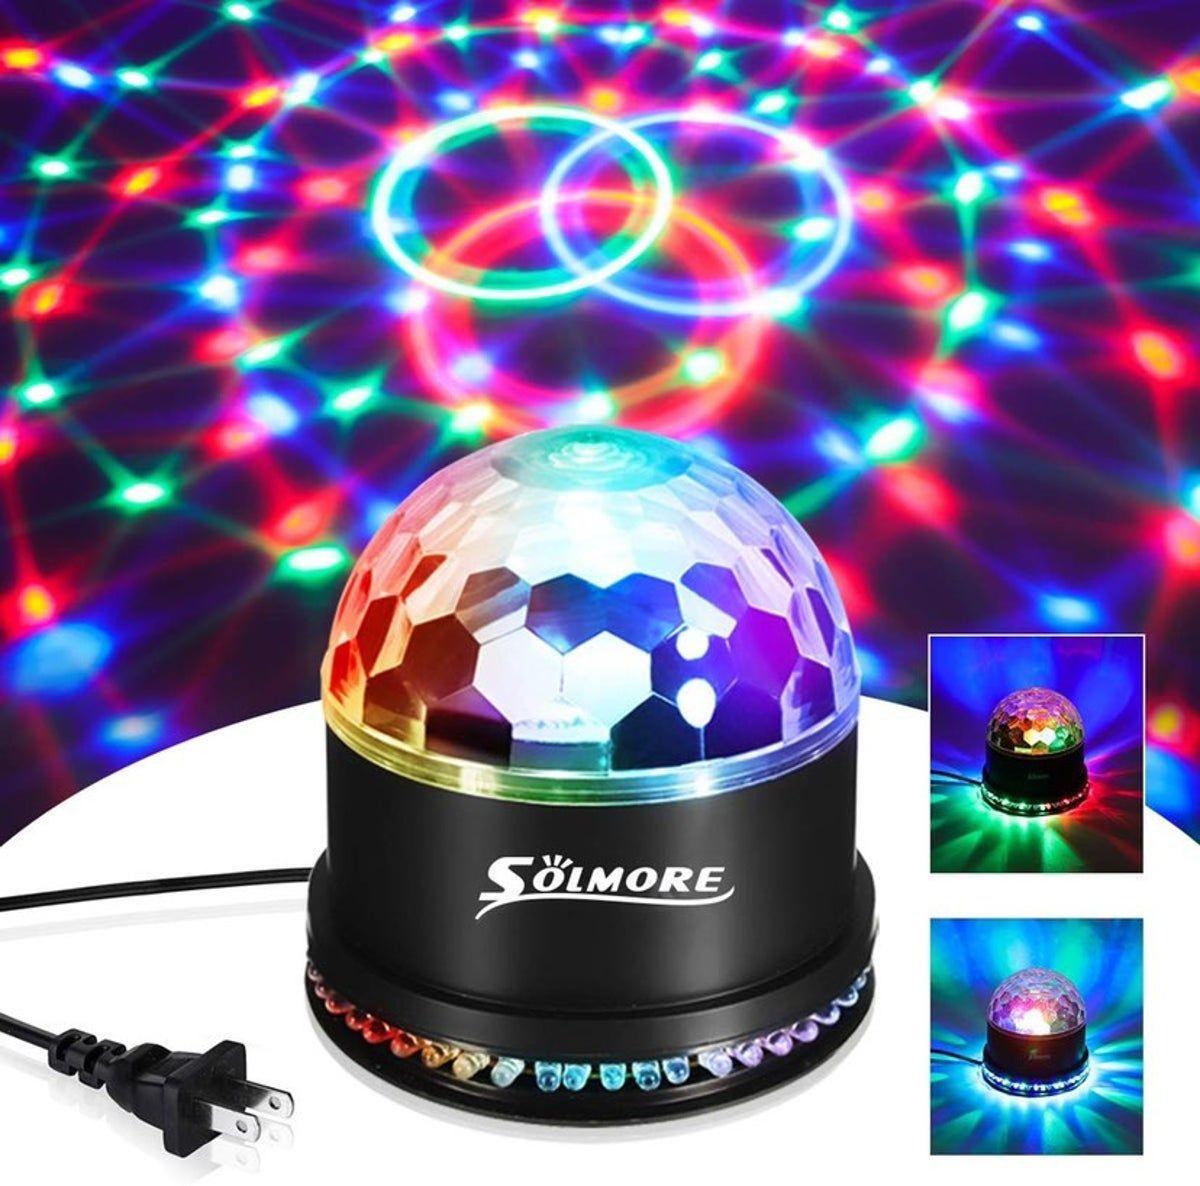 Pin By Melissa Camargo On Deco In 2020 Disco Ball Light Ball Lights Disco Lights